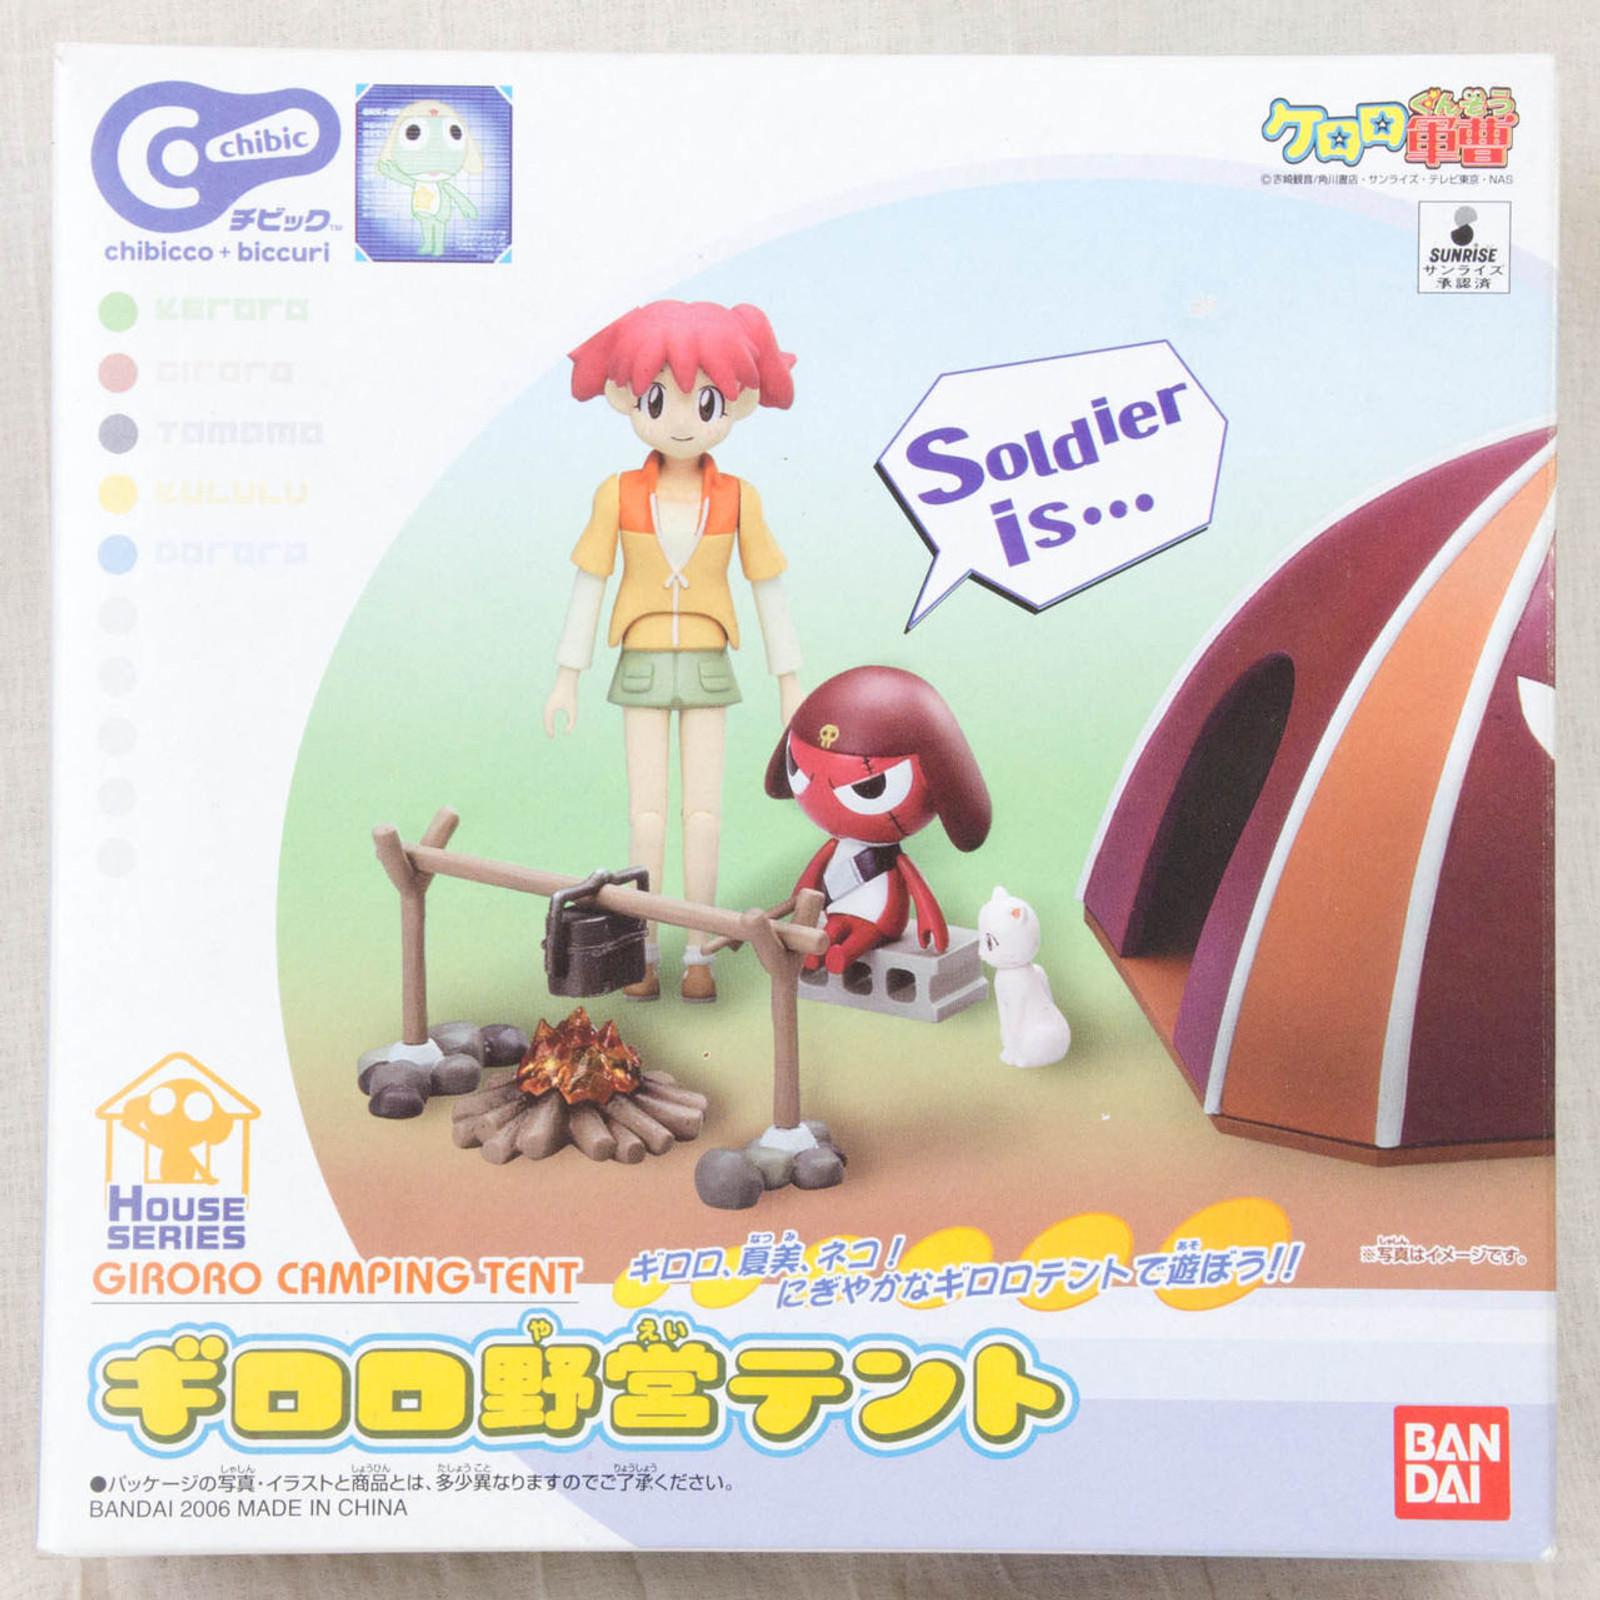 RARE! Sgt. Frog Keroro Gunso Giroro Camping Tent Diorama Figure Bandai JAPAN ANIME MANGA